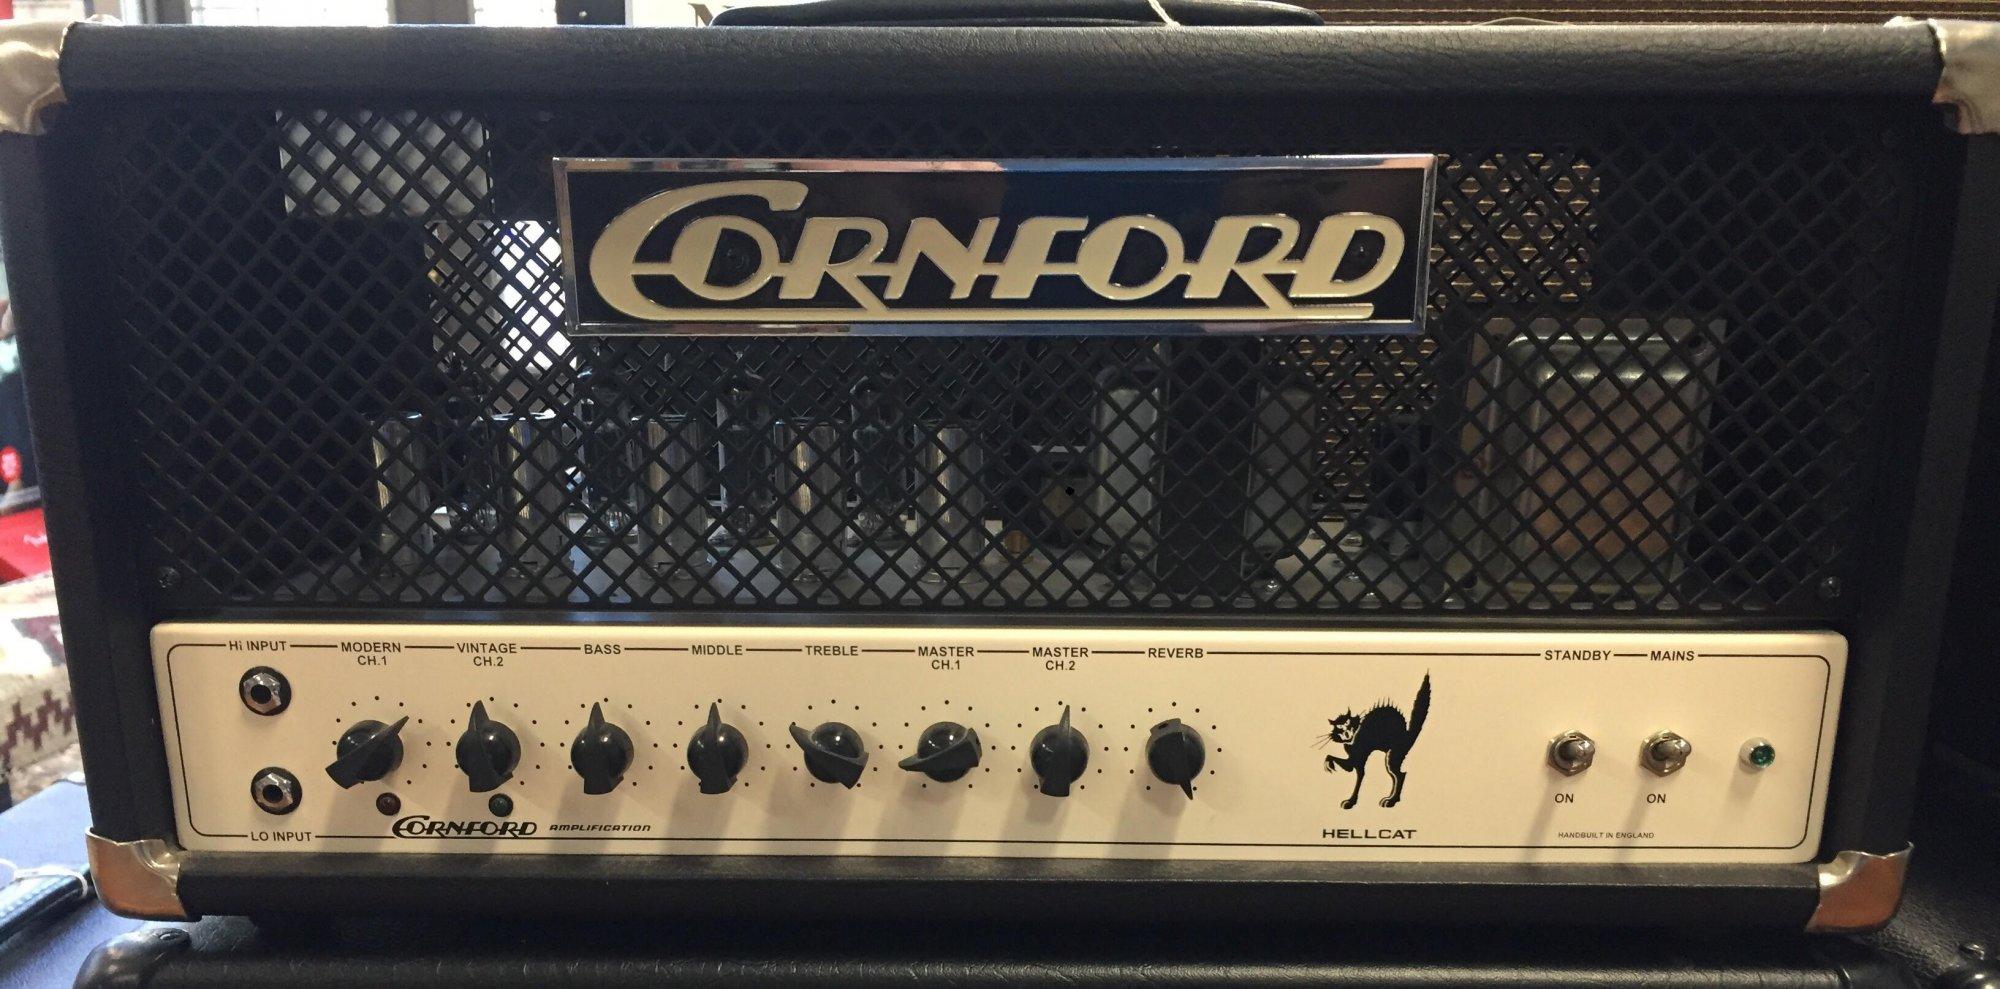 Consignment Ken Cornford Hellcat